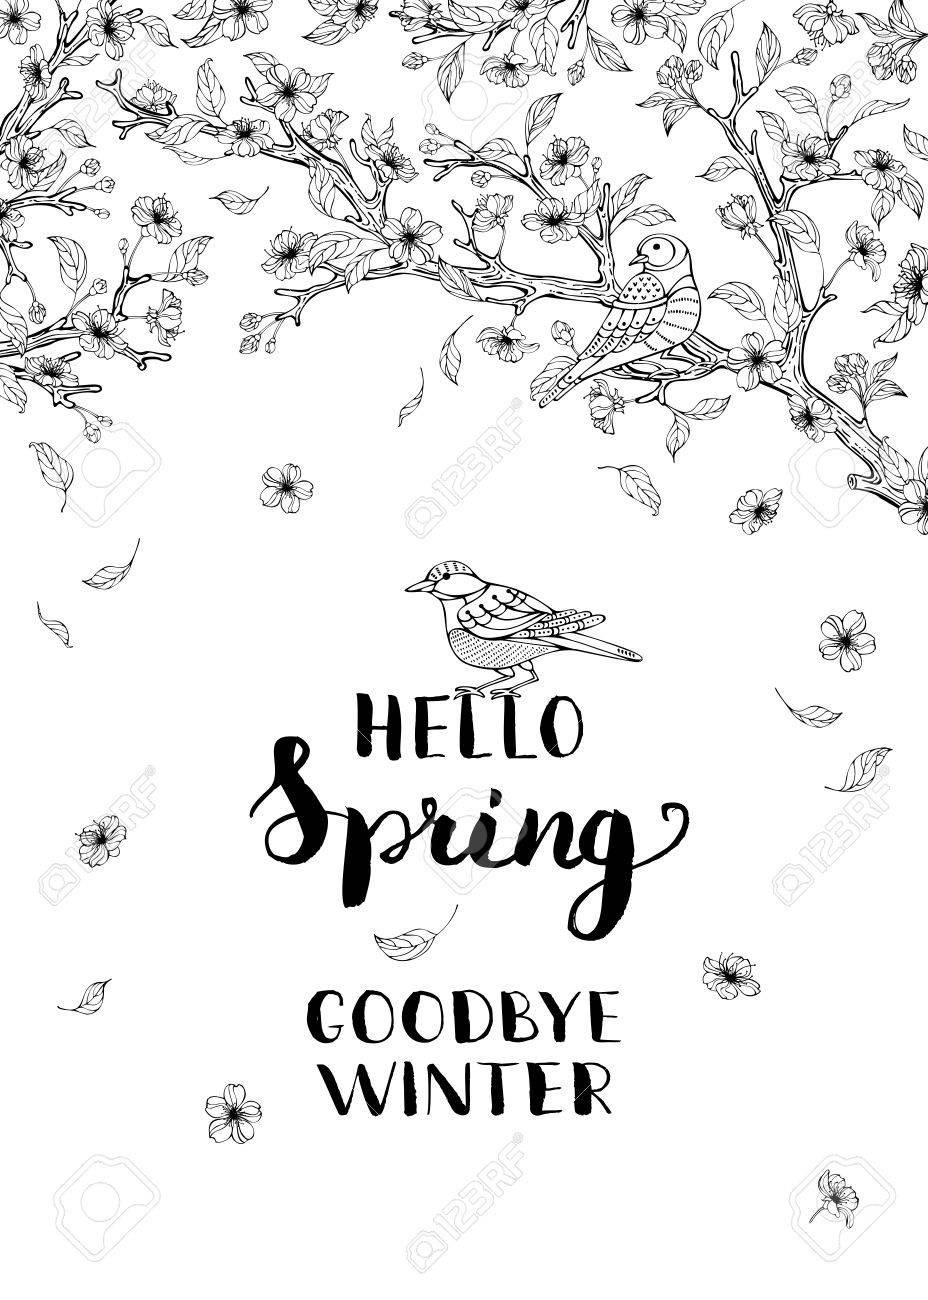 Hallo Frühling, Winter Ade! Frühlings-Blüten Und Vögel Auf Baum ...